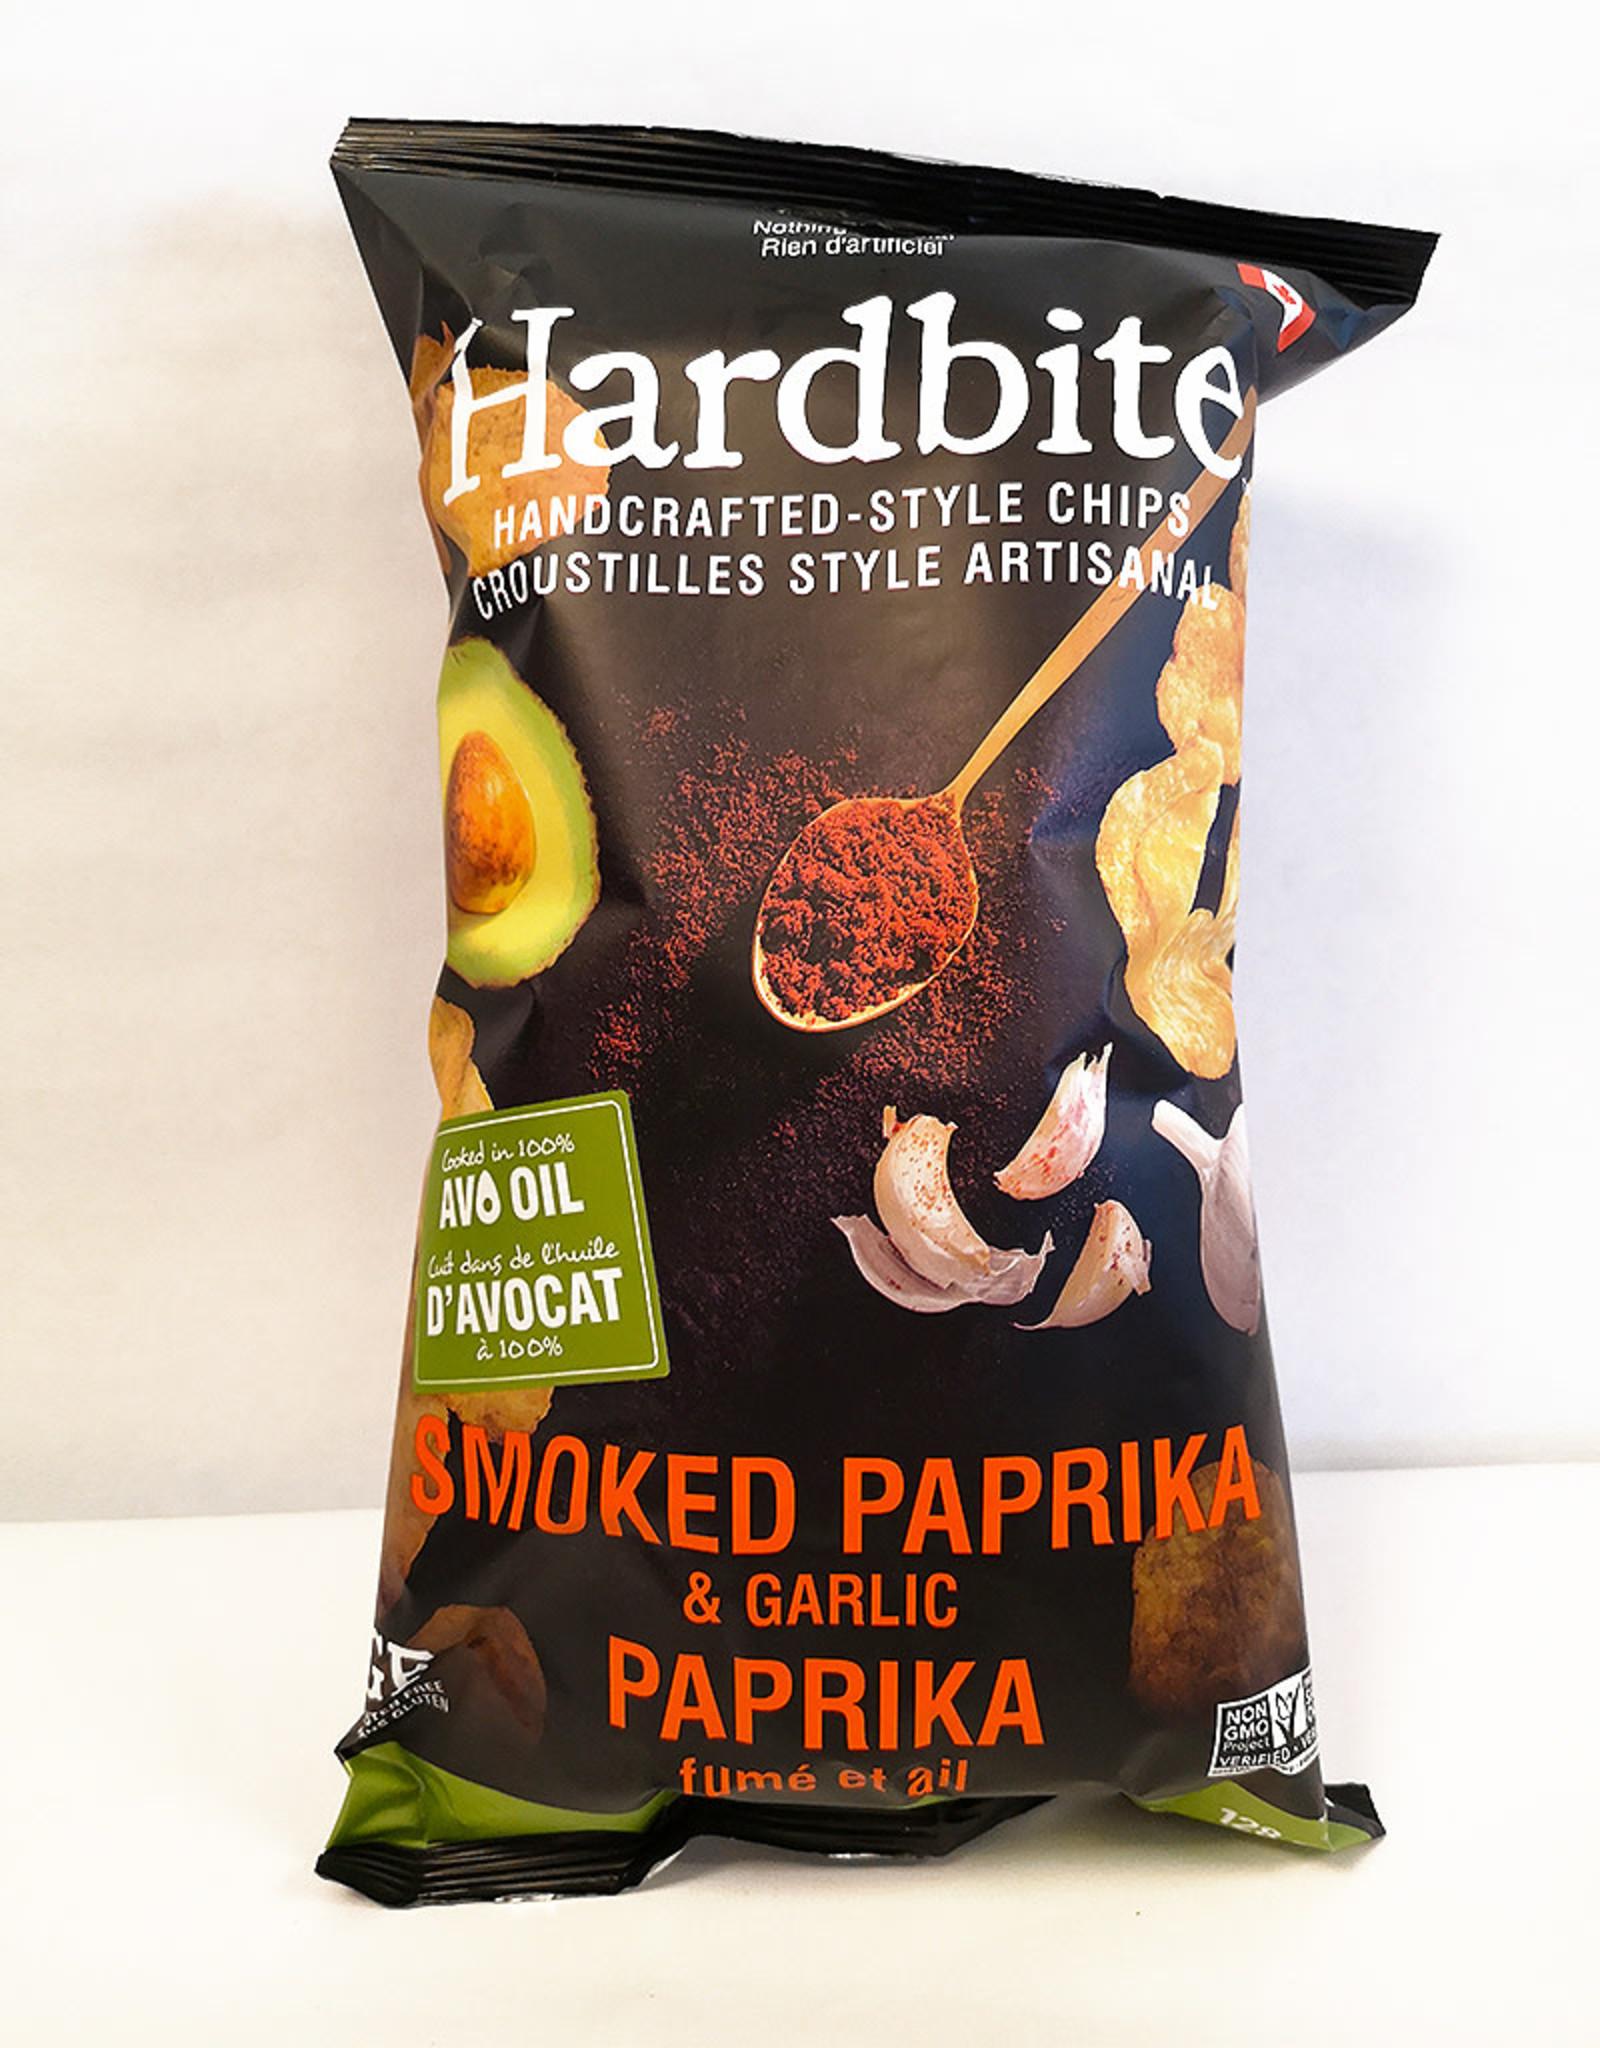 Hardbites Hardbite - Chips, Avocado Oil Smoked Paprika (128g)